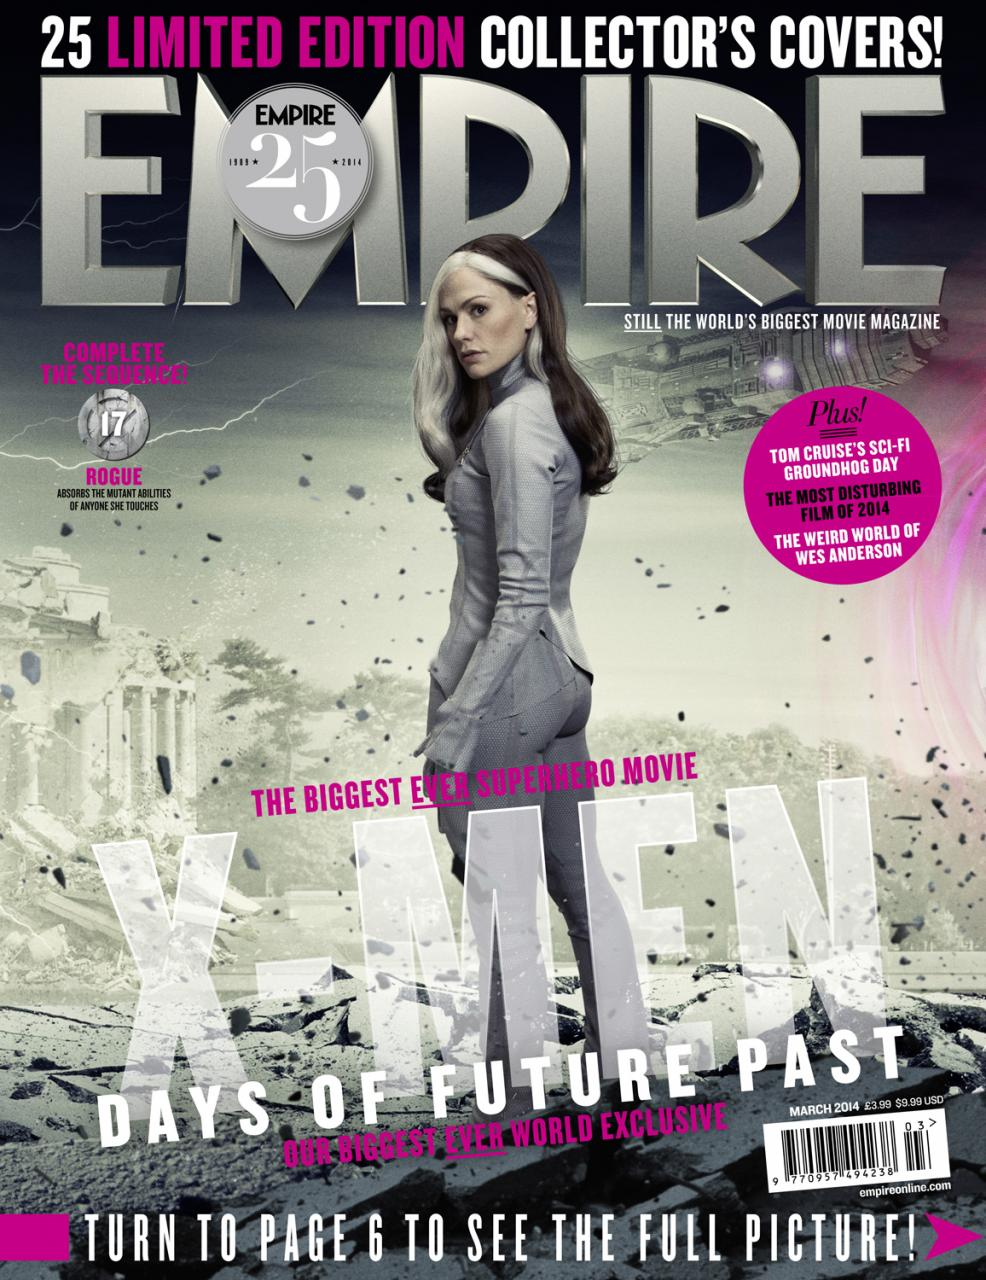 X-MEN DAYS OF FUTURE PAST Empire Magazine Covers  (9)